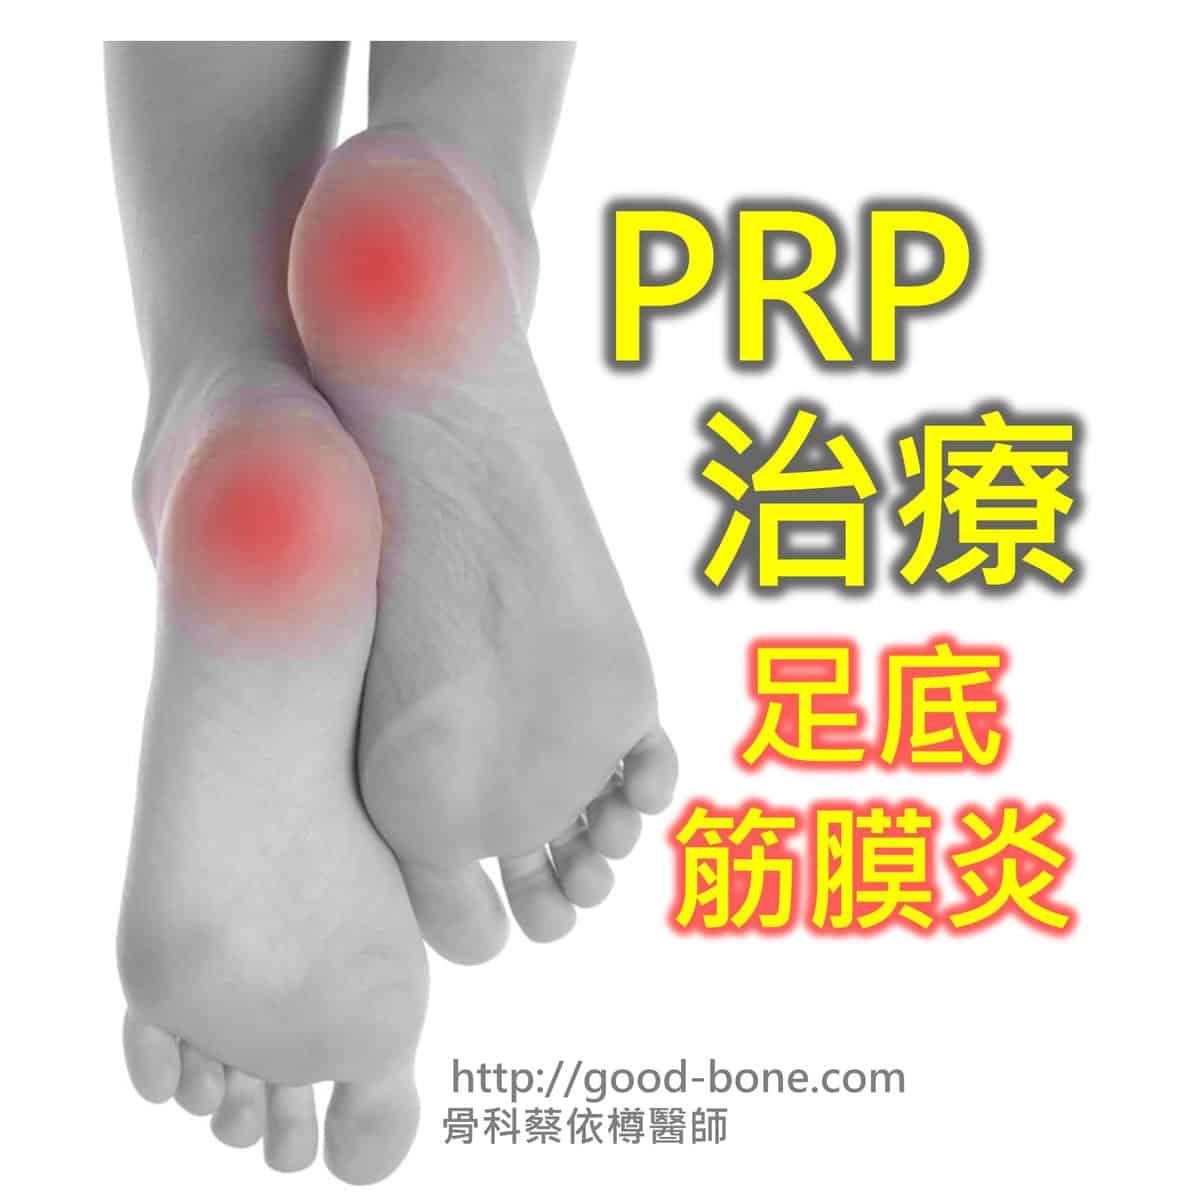 PRP 治療 足底筋膜炎 MB 骨科蔡依樽醫師 https://good-bone.com/